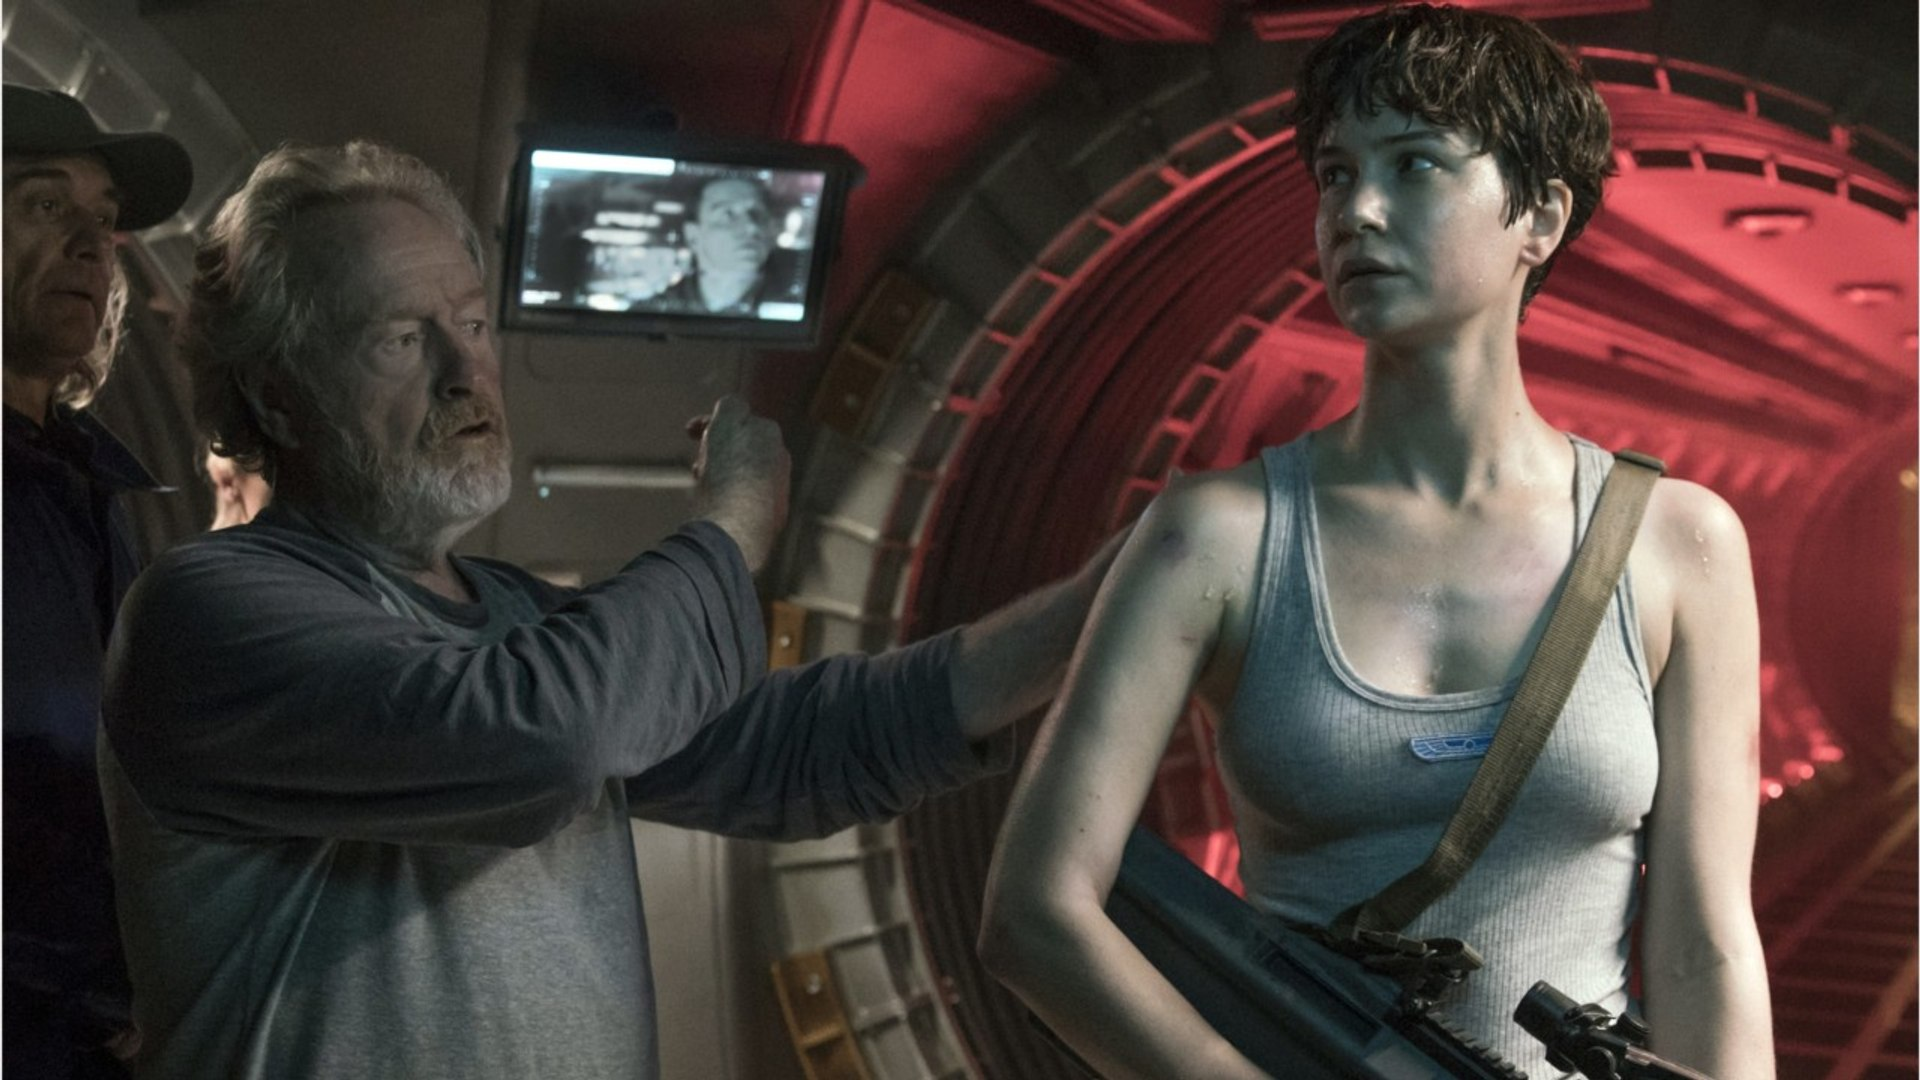 'Alien: Covenant' Dethrones 'Guardians 2' At Box Office